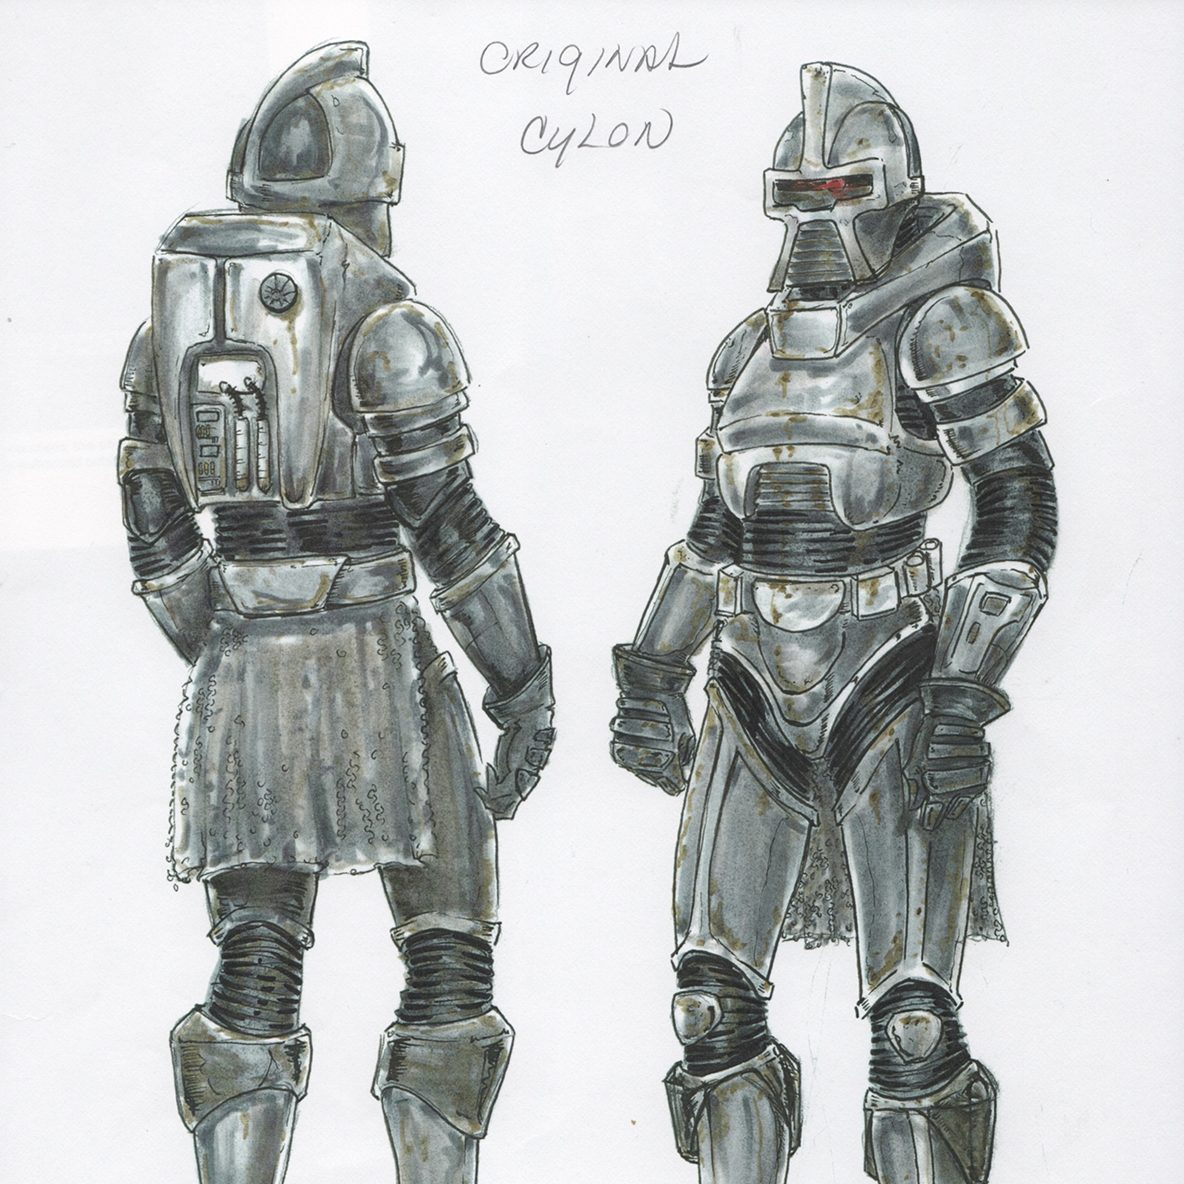 BattleG Cylon Original Sketch e1602862204852 20 Things You Probably Didn't Know About The Original Battlestar Galactica